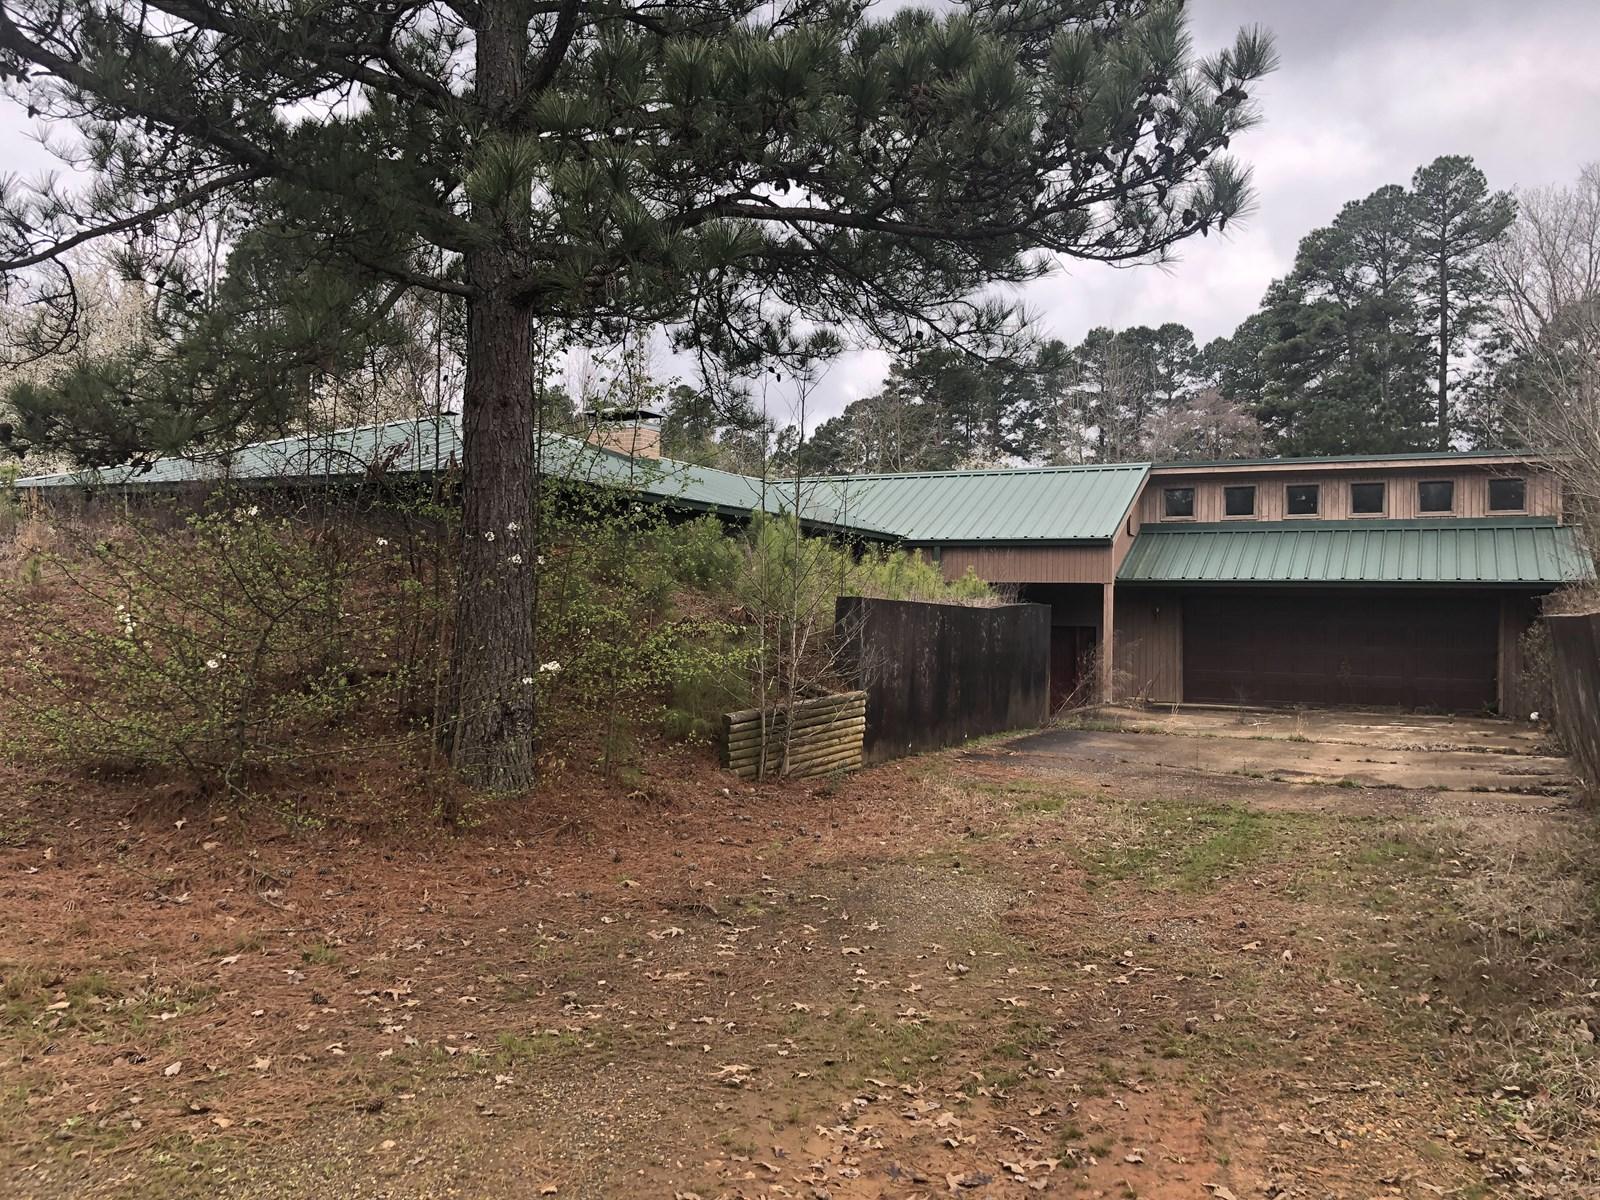 Large Home with acreage for sale in Arkadelphia, Arkansas